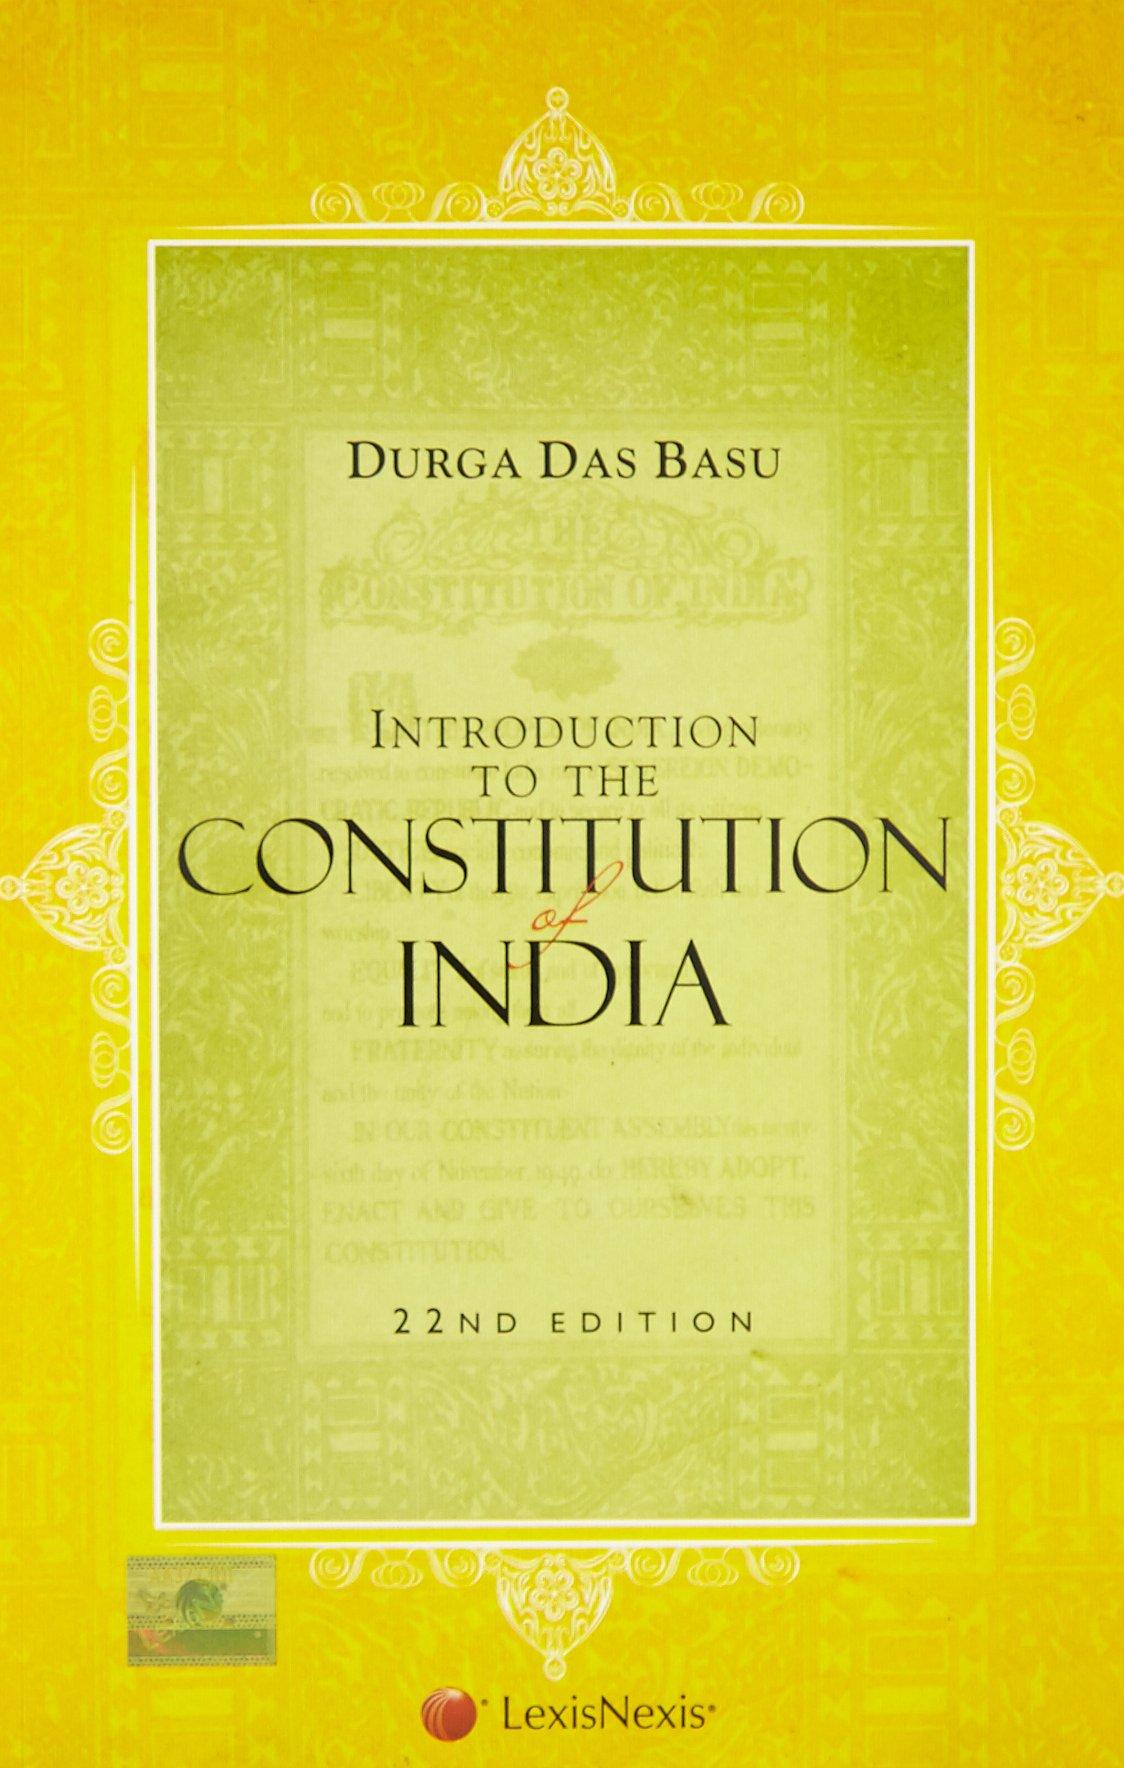 Dd basu constitution of india pdf in hindi catbliss's blog.